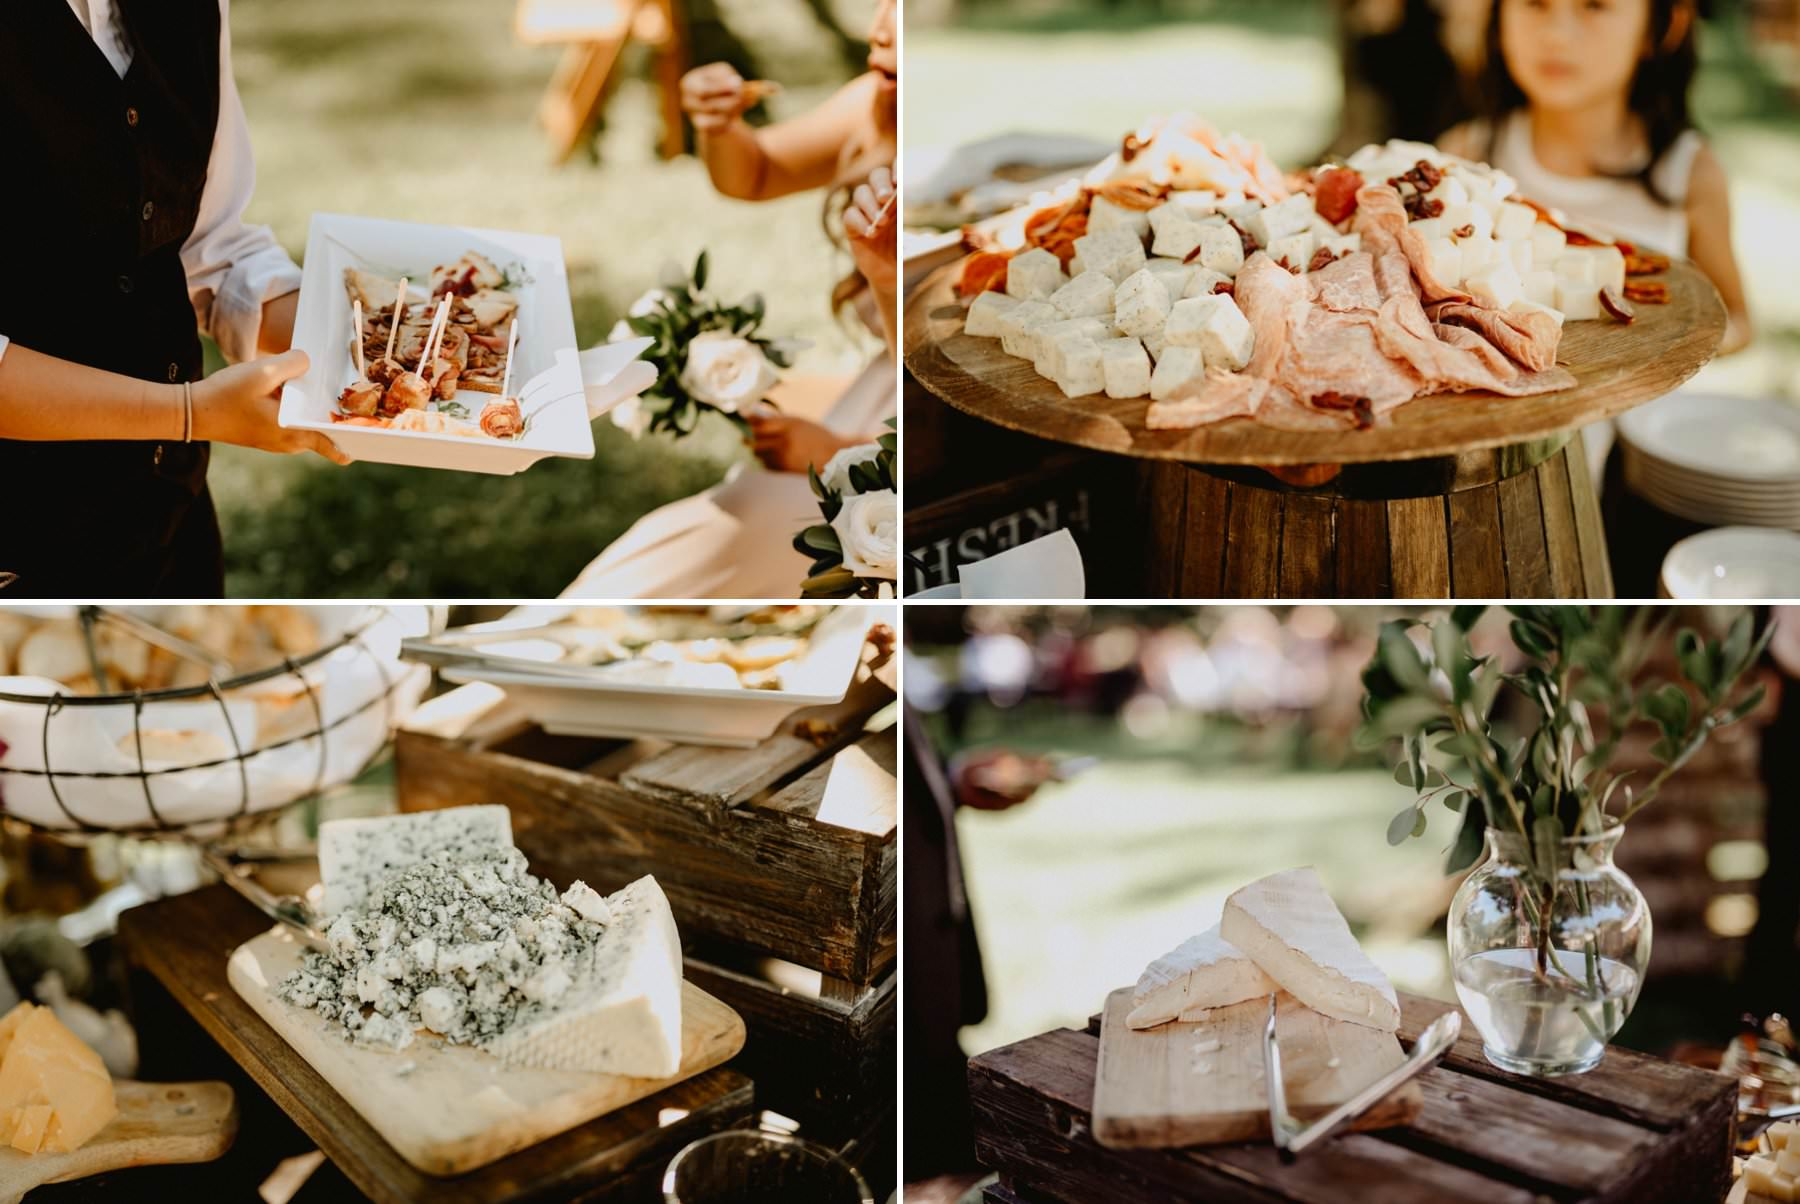 Appleford-estate-wedding-95.jpg